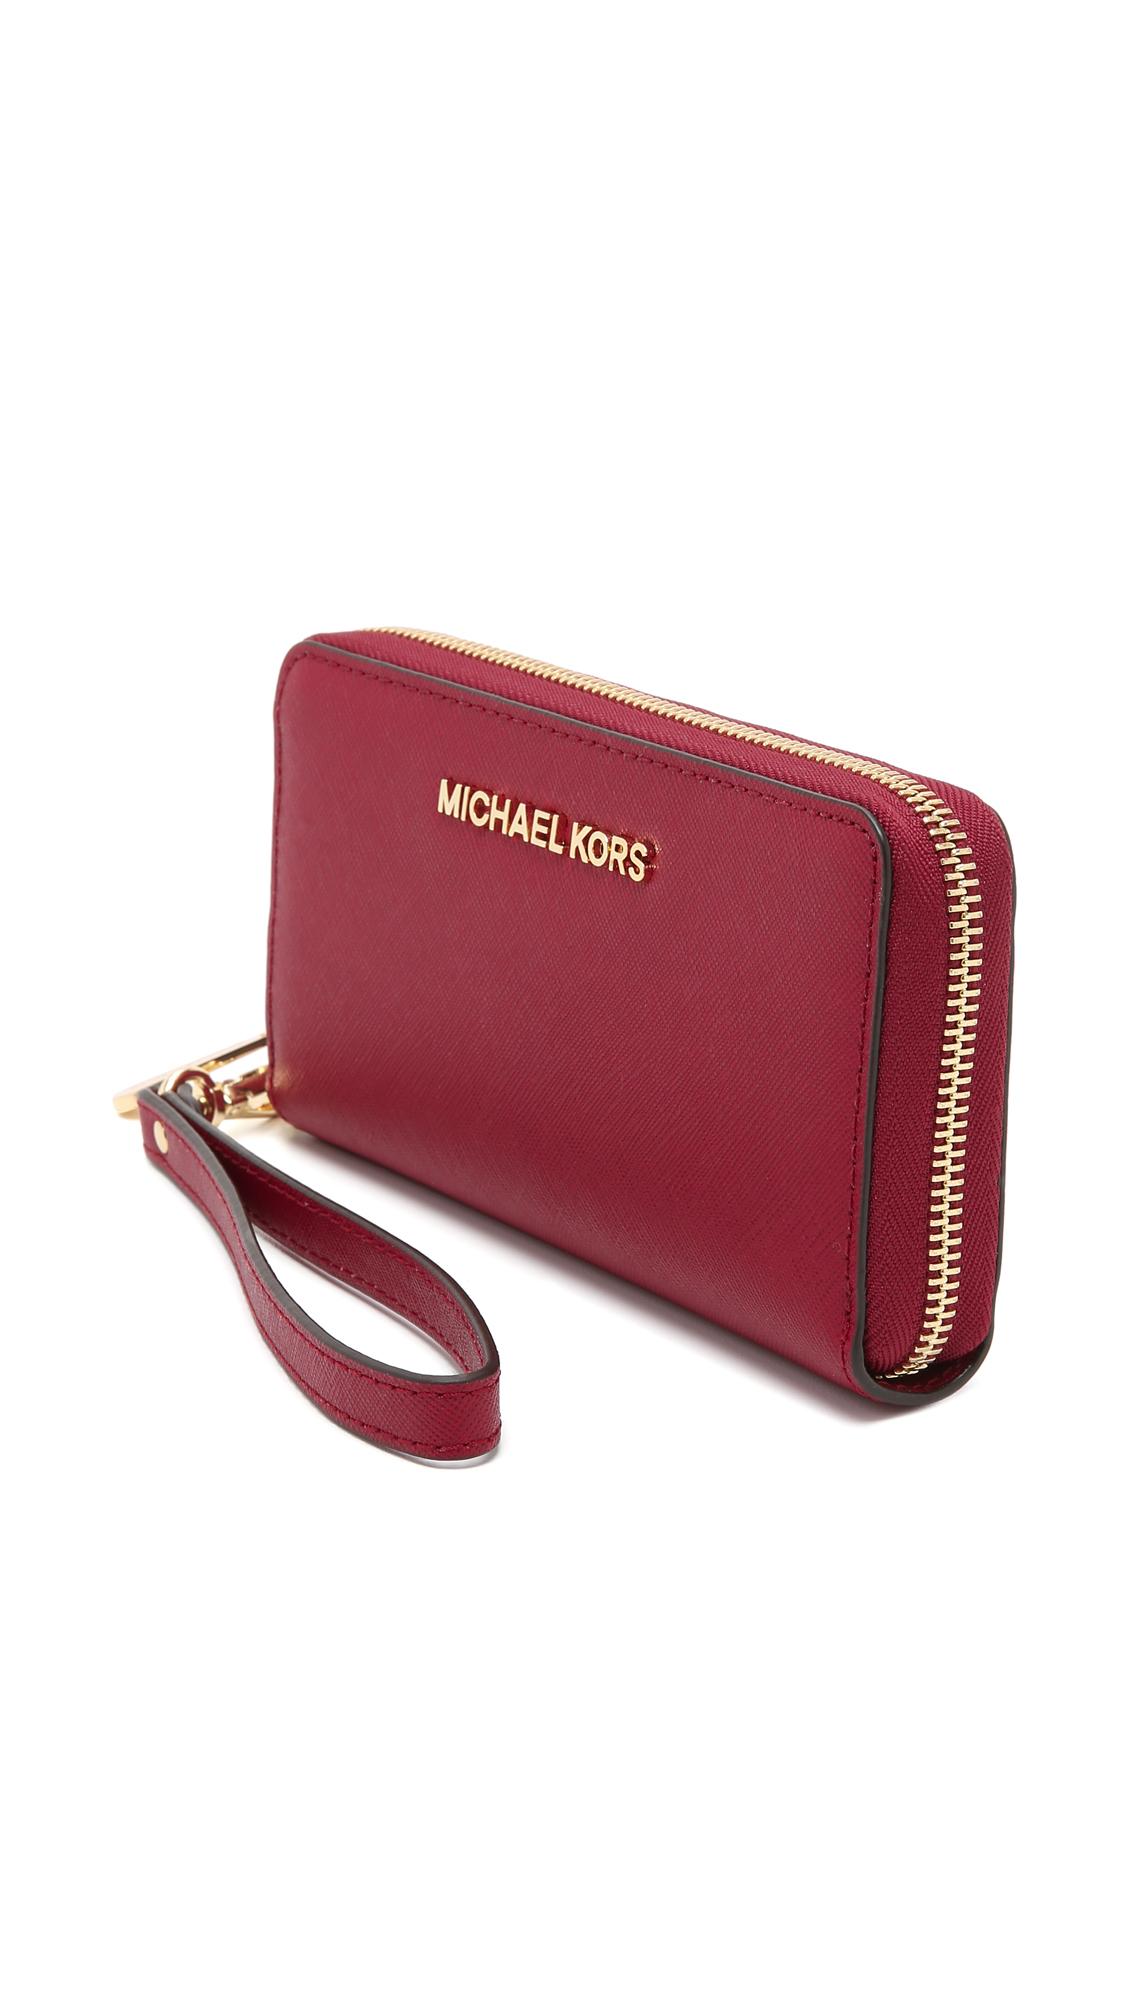 529e3122b92f Lyst - MICHAEL Michael Kors Jet Set Large Phone Case Wallet - Cherry ...